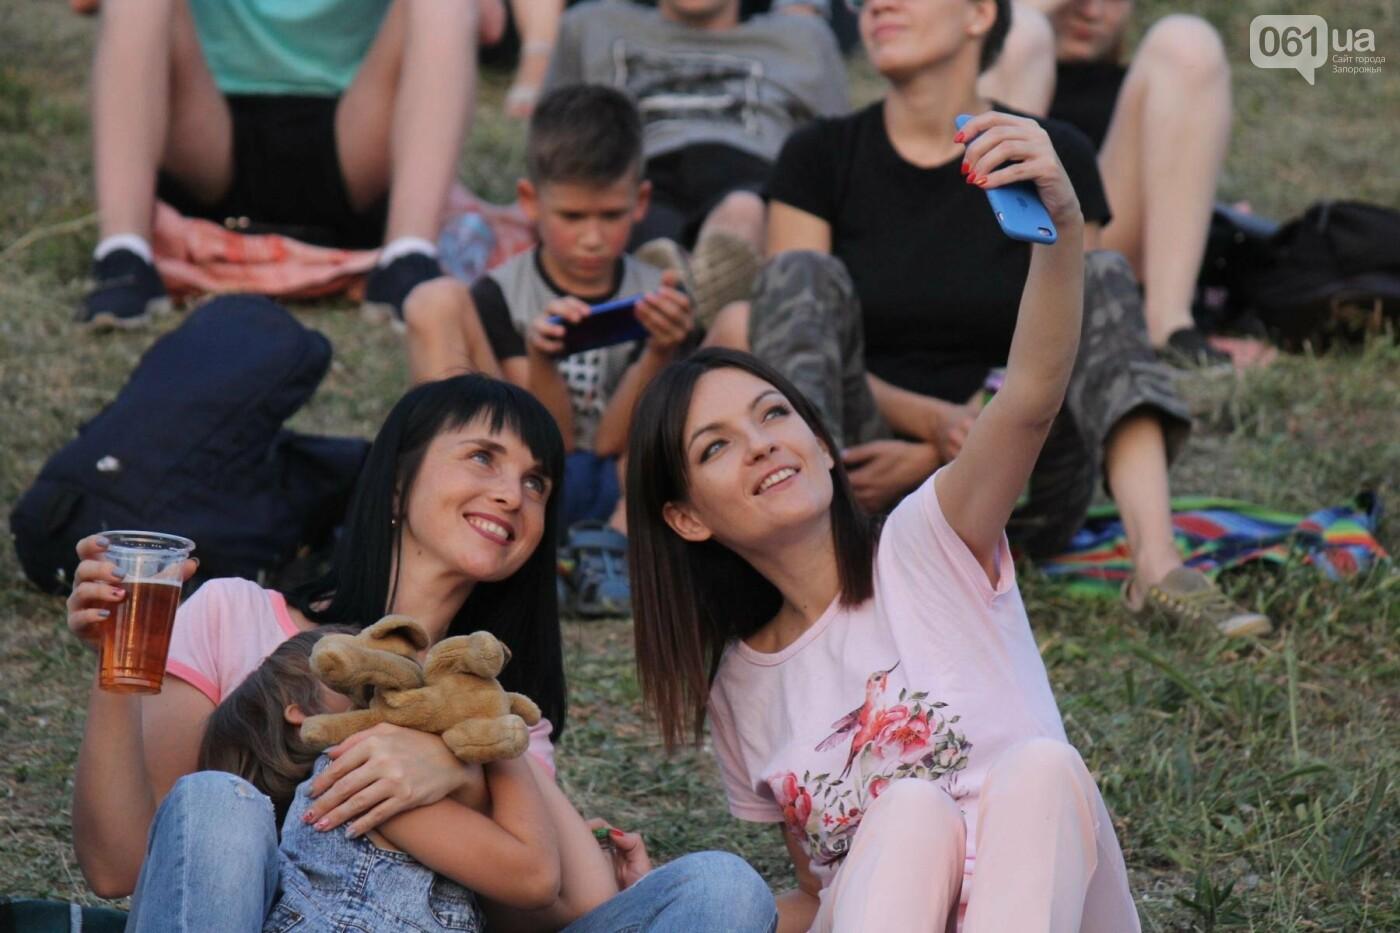 Найди себя: 50 портретов посетителей фестиваля Khortytsia Freedom, – ФОТОРЕПОРТАЖ, фото-25